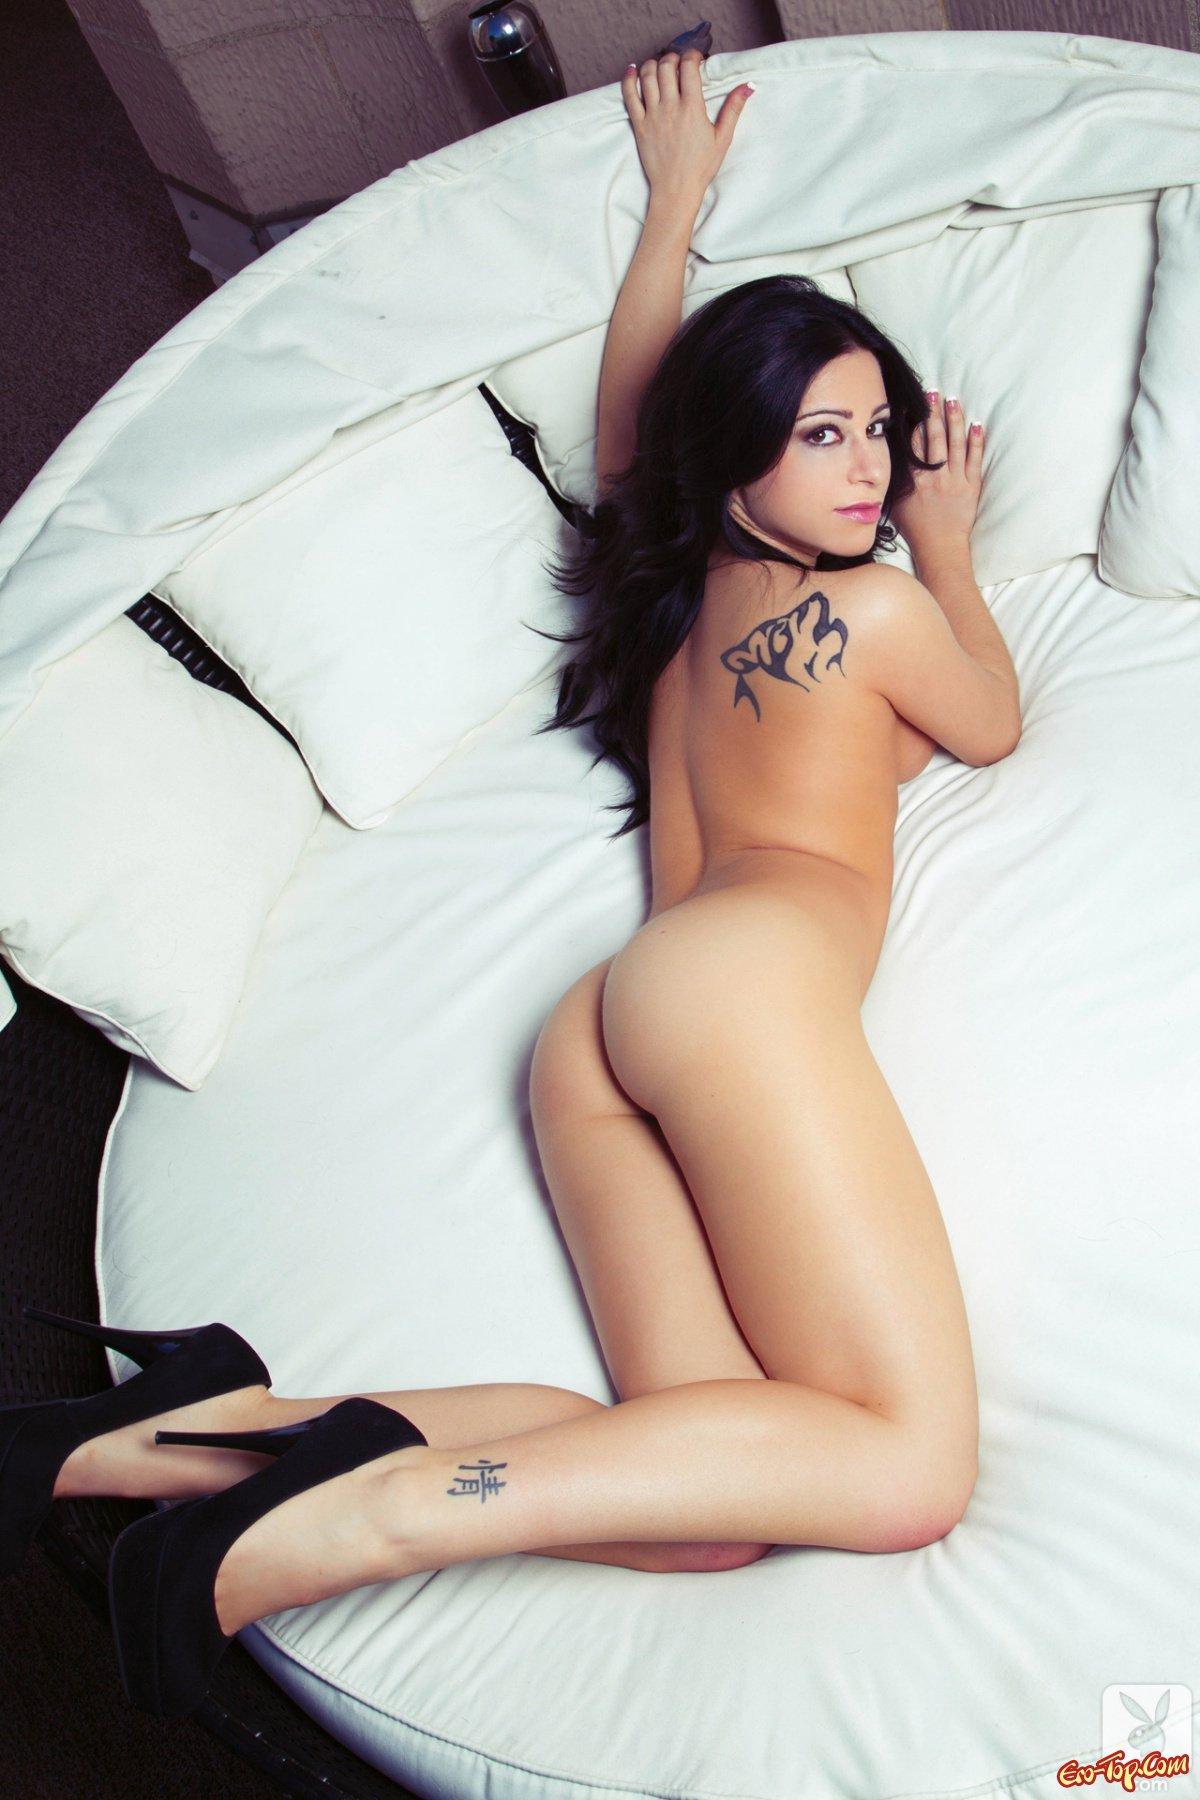 Adriana Lynn - русая порноактрисса плейбоя